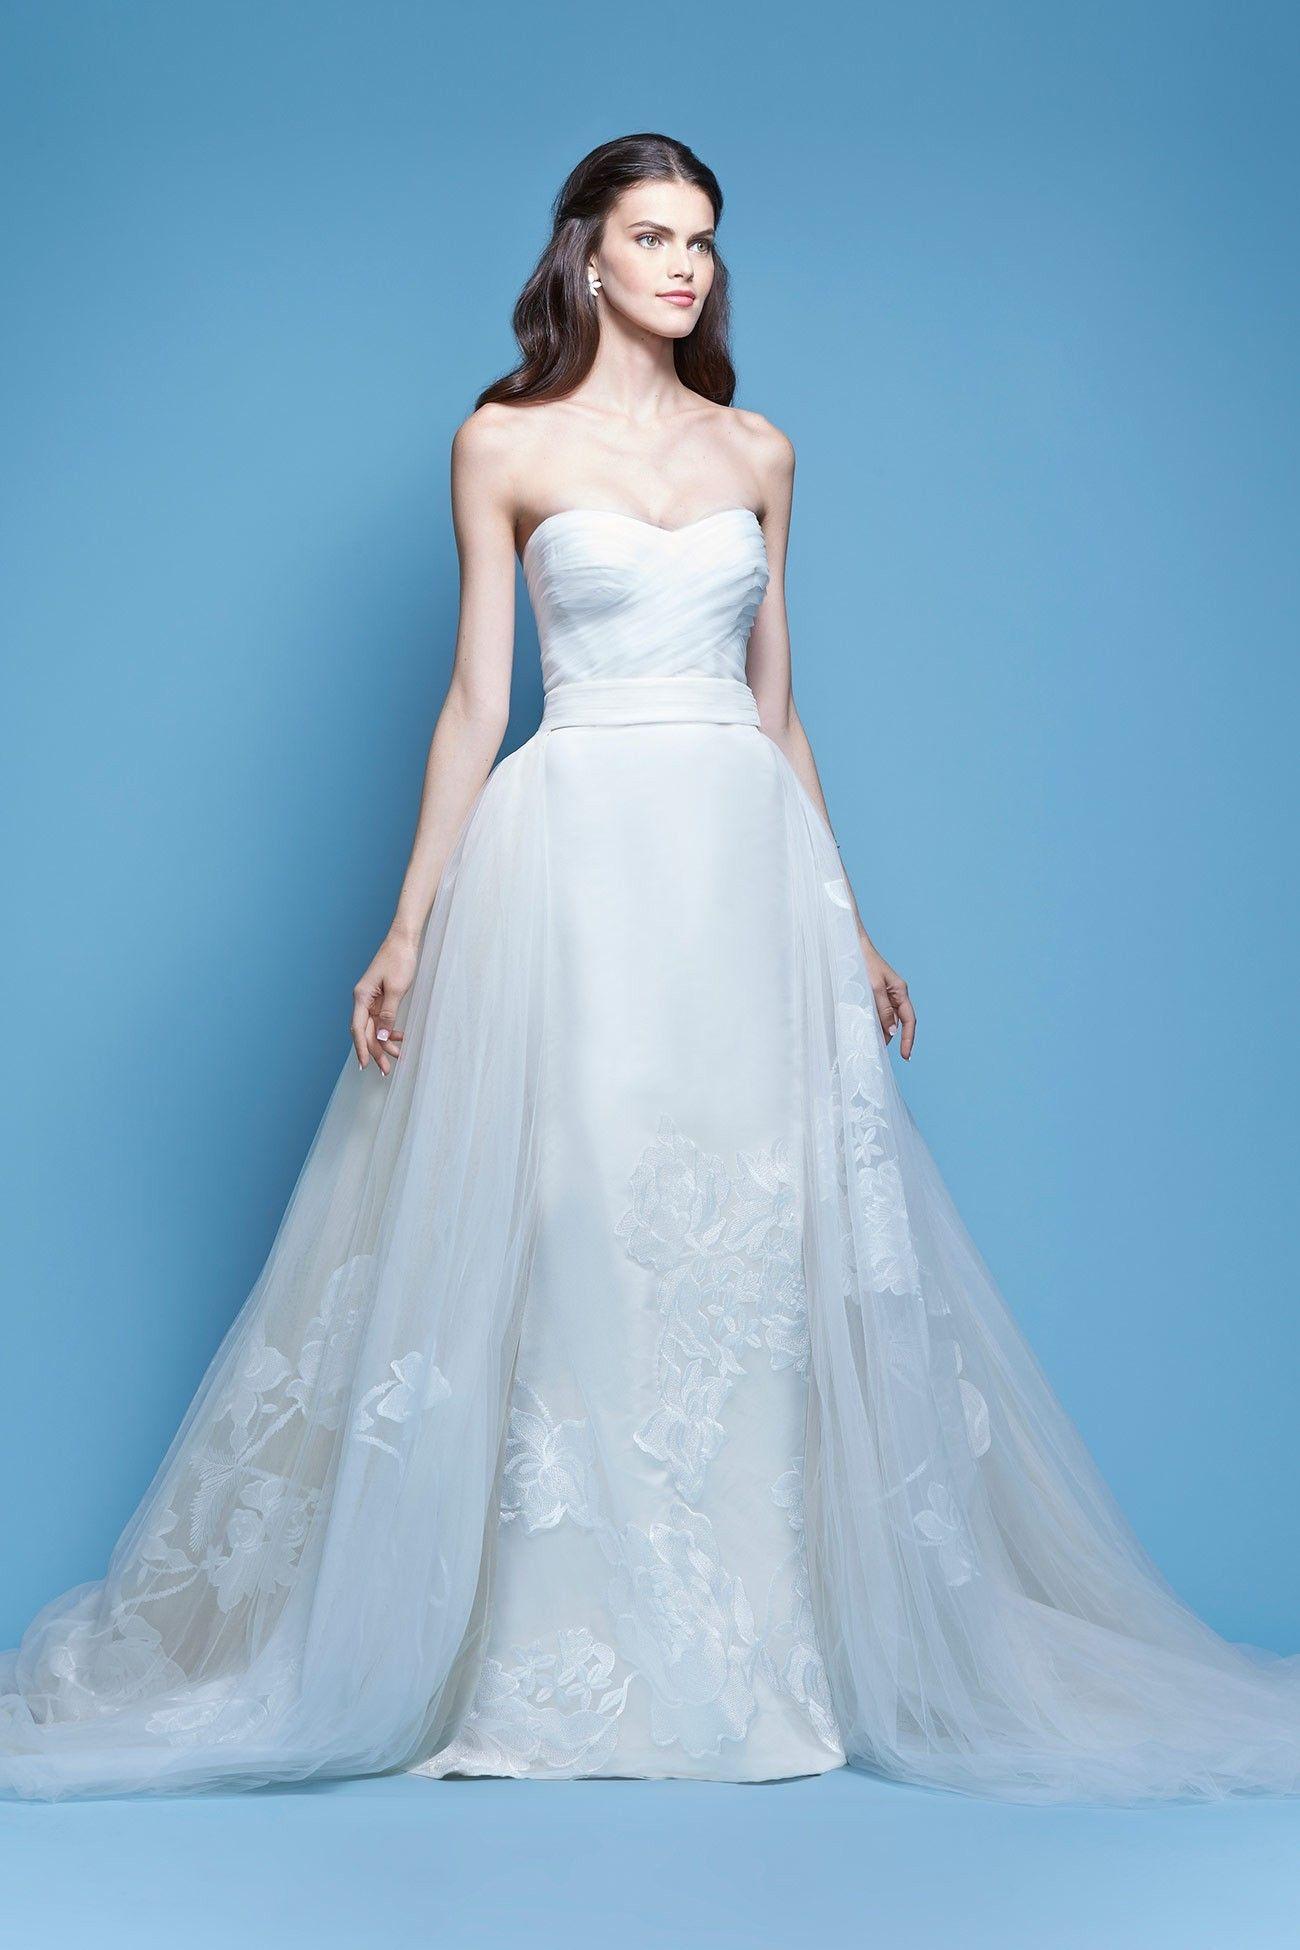 Funky Hideous Wedding Dresses Frieze - All Wedding Dresses ...